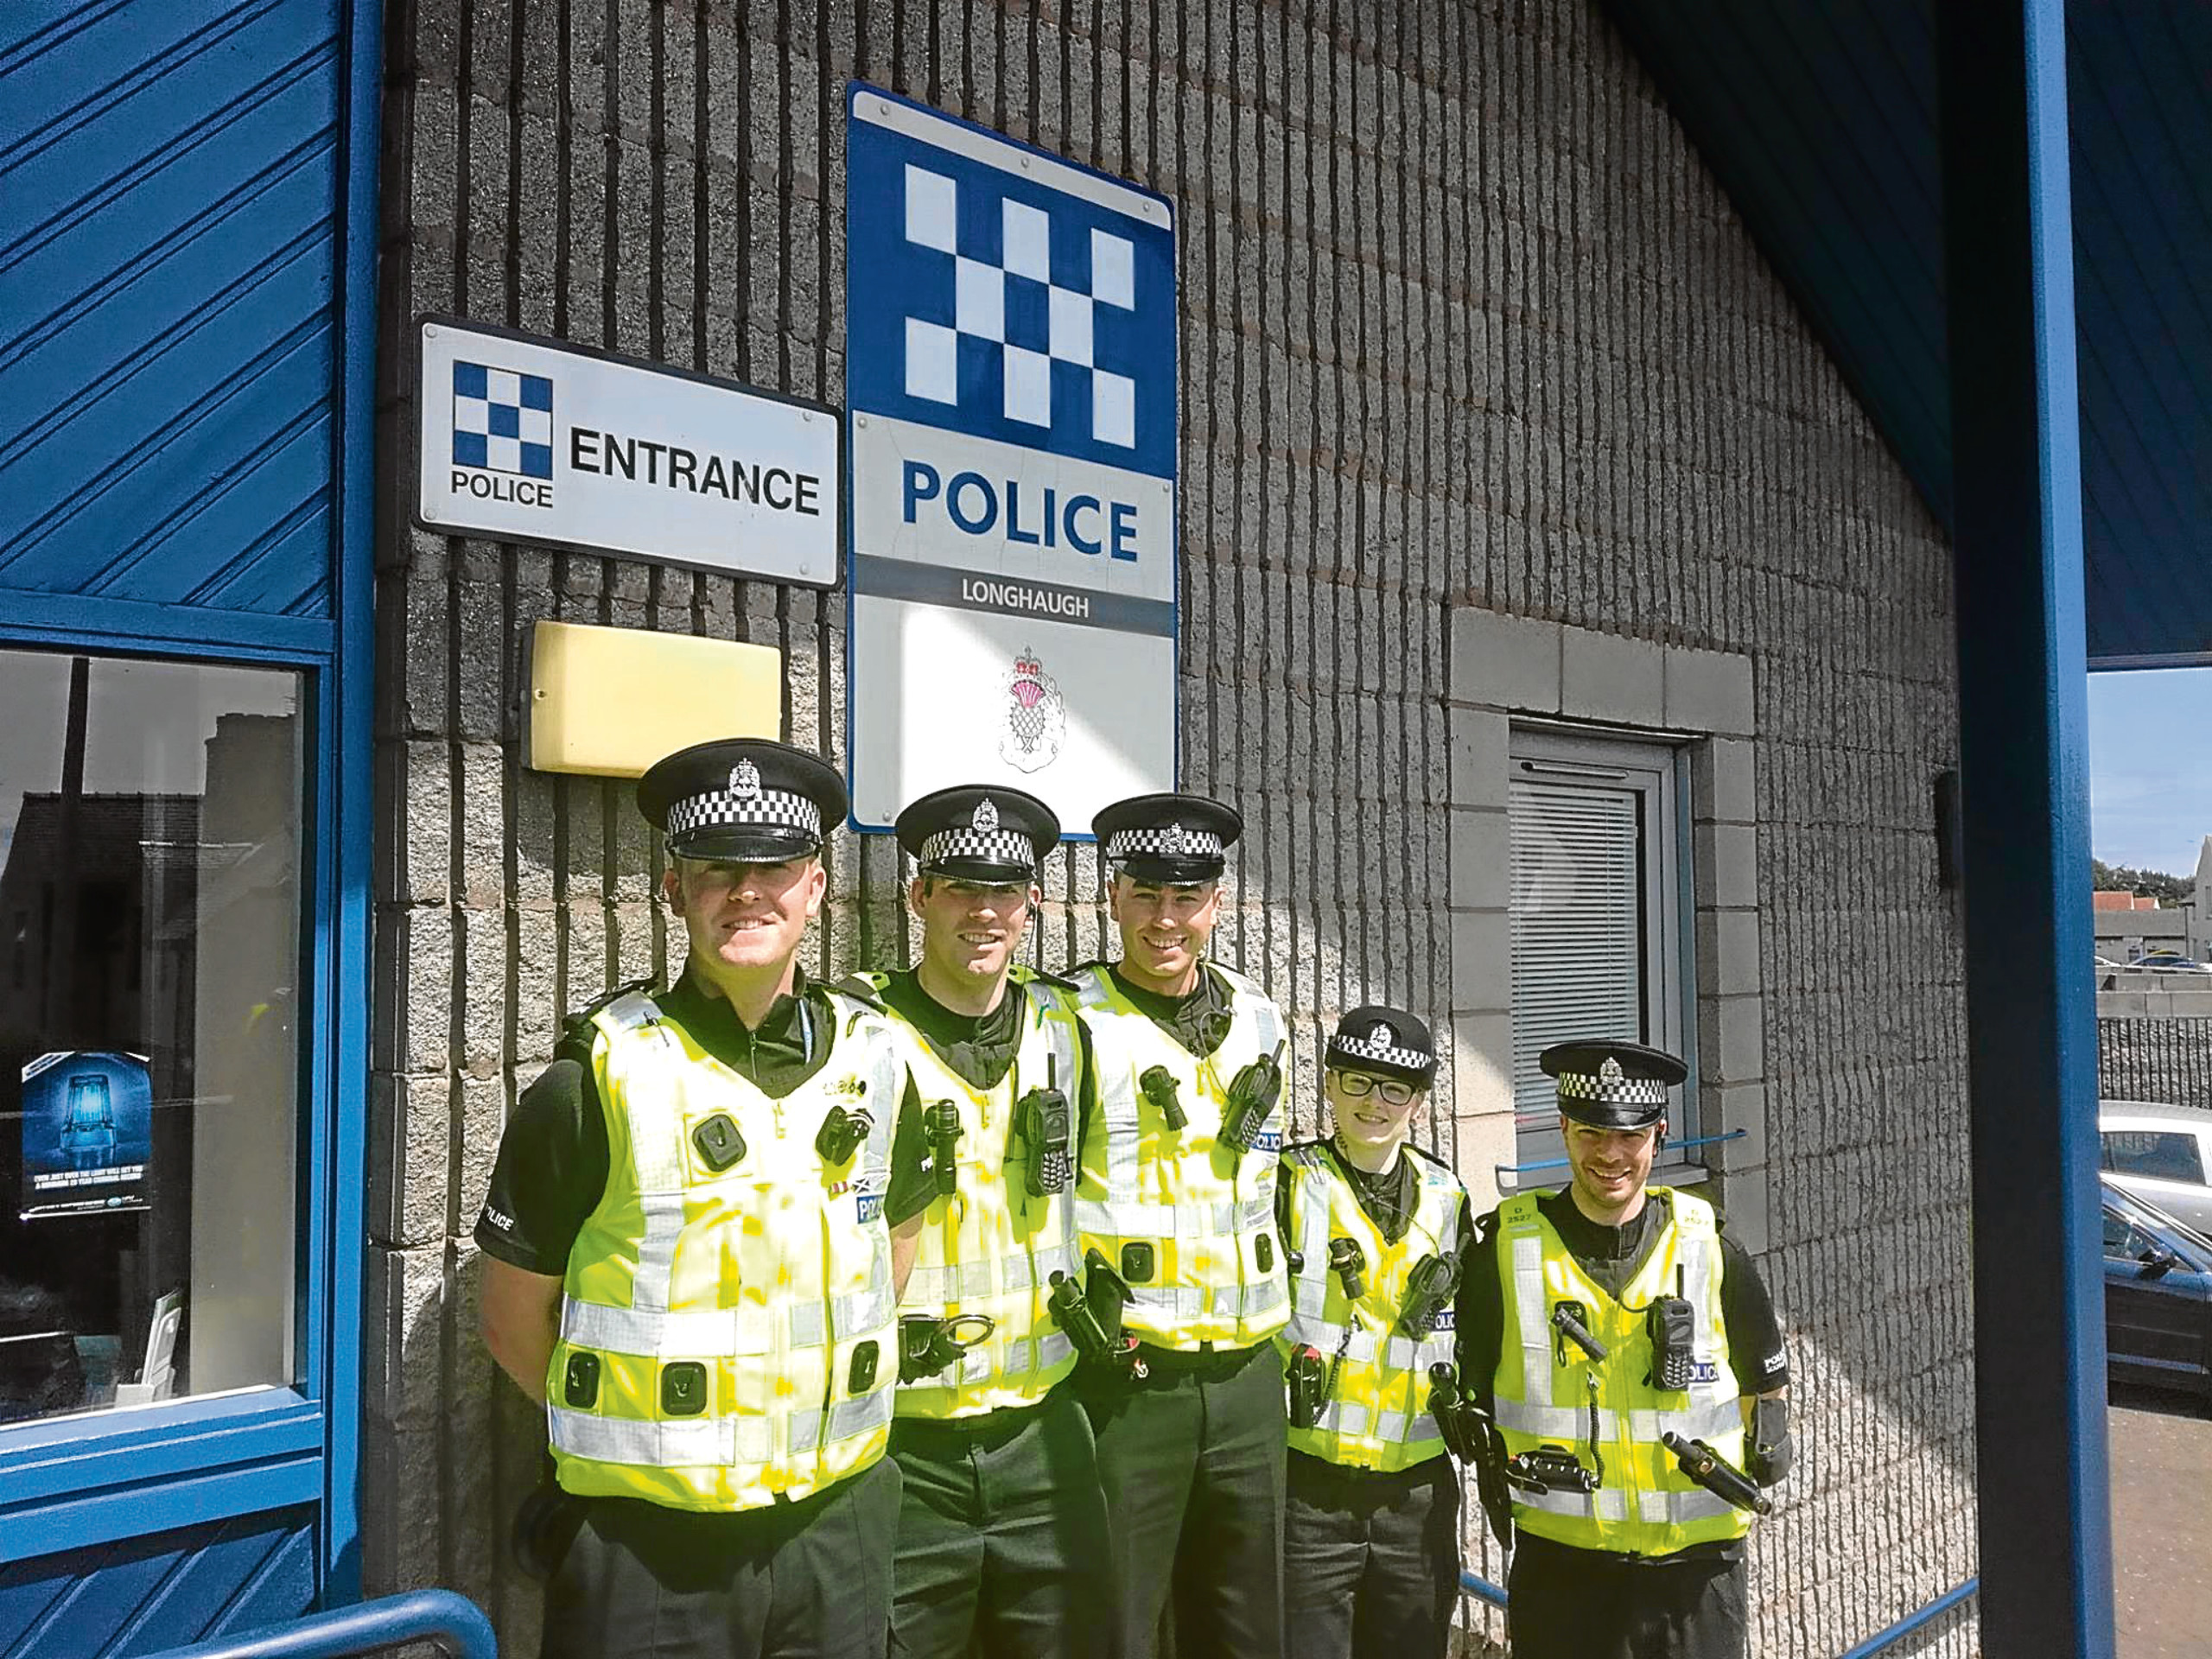 The Longhaugh community police team.